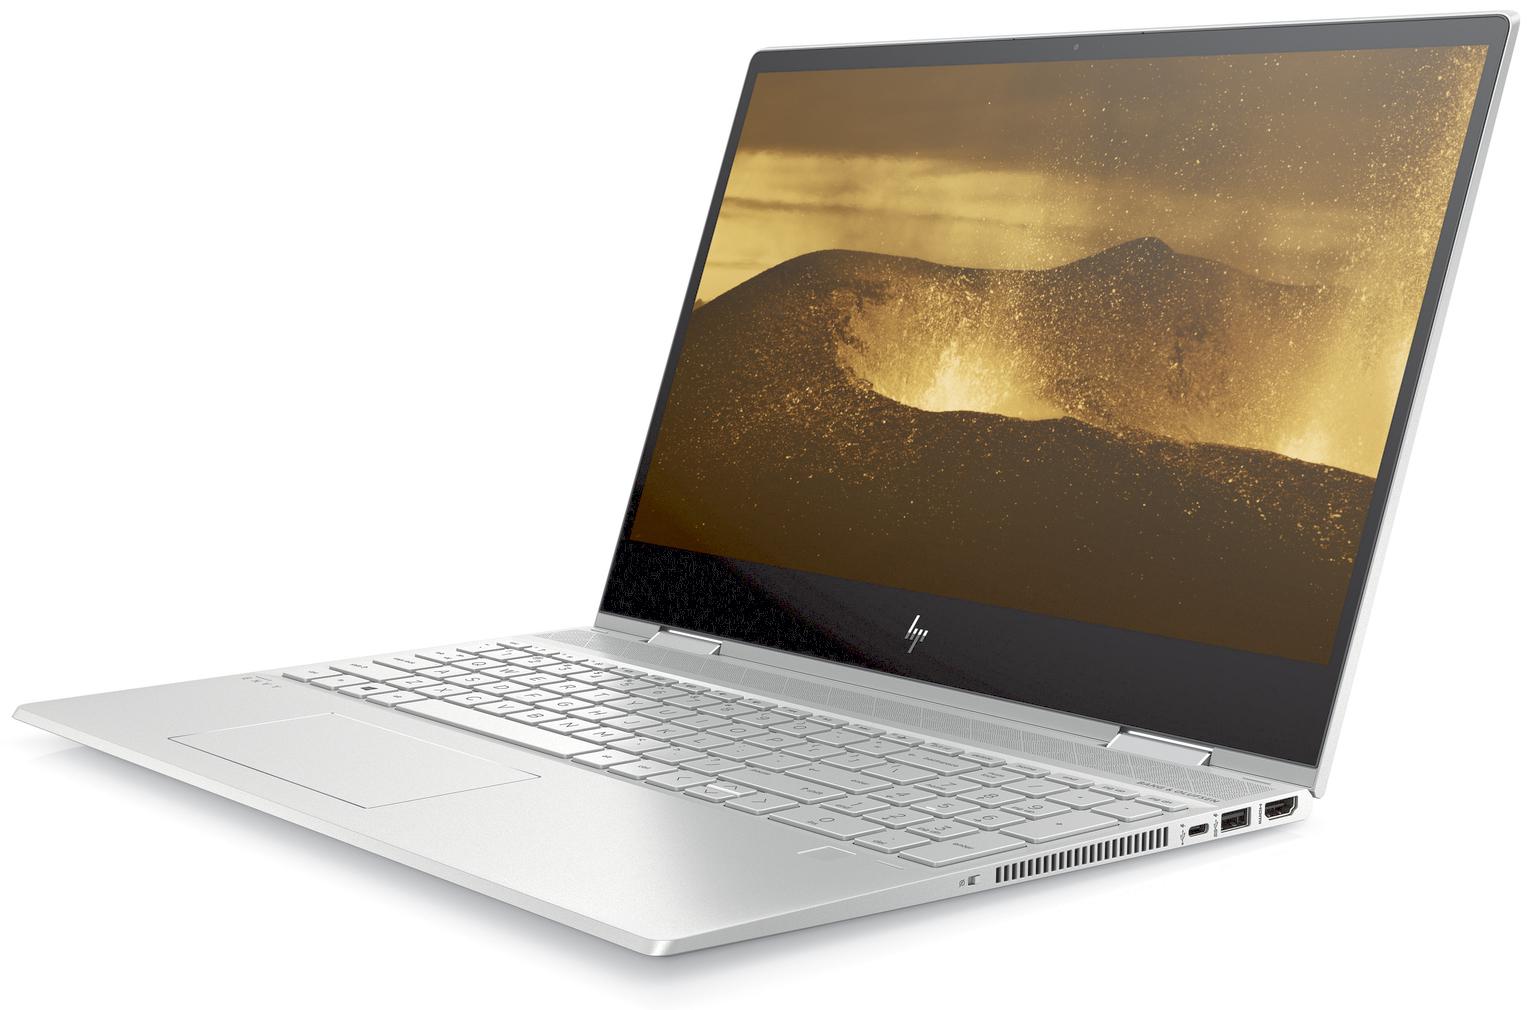 HP Reveals Envy x360 15 Laptops with AMD's Latest Ryzen APUs